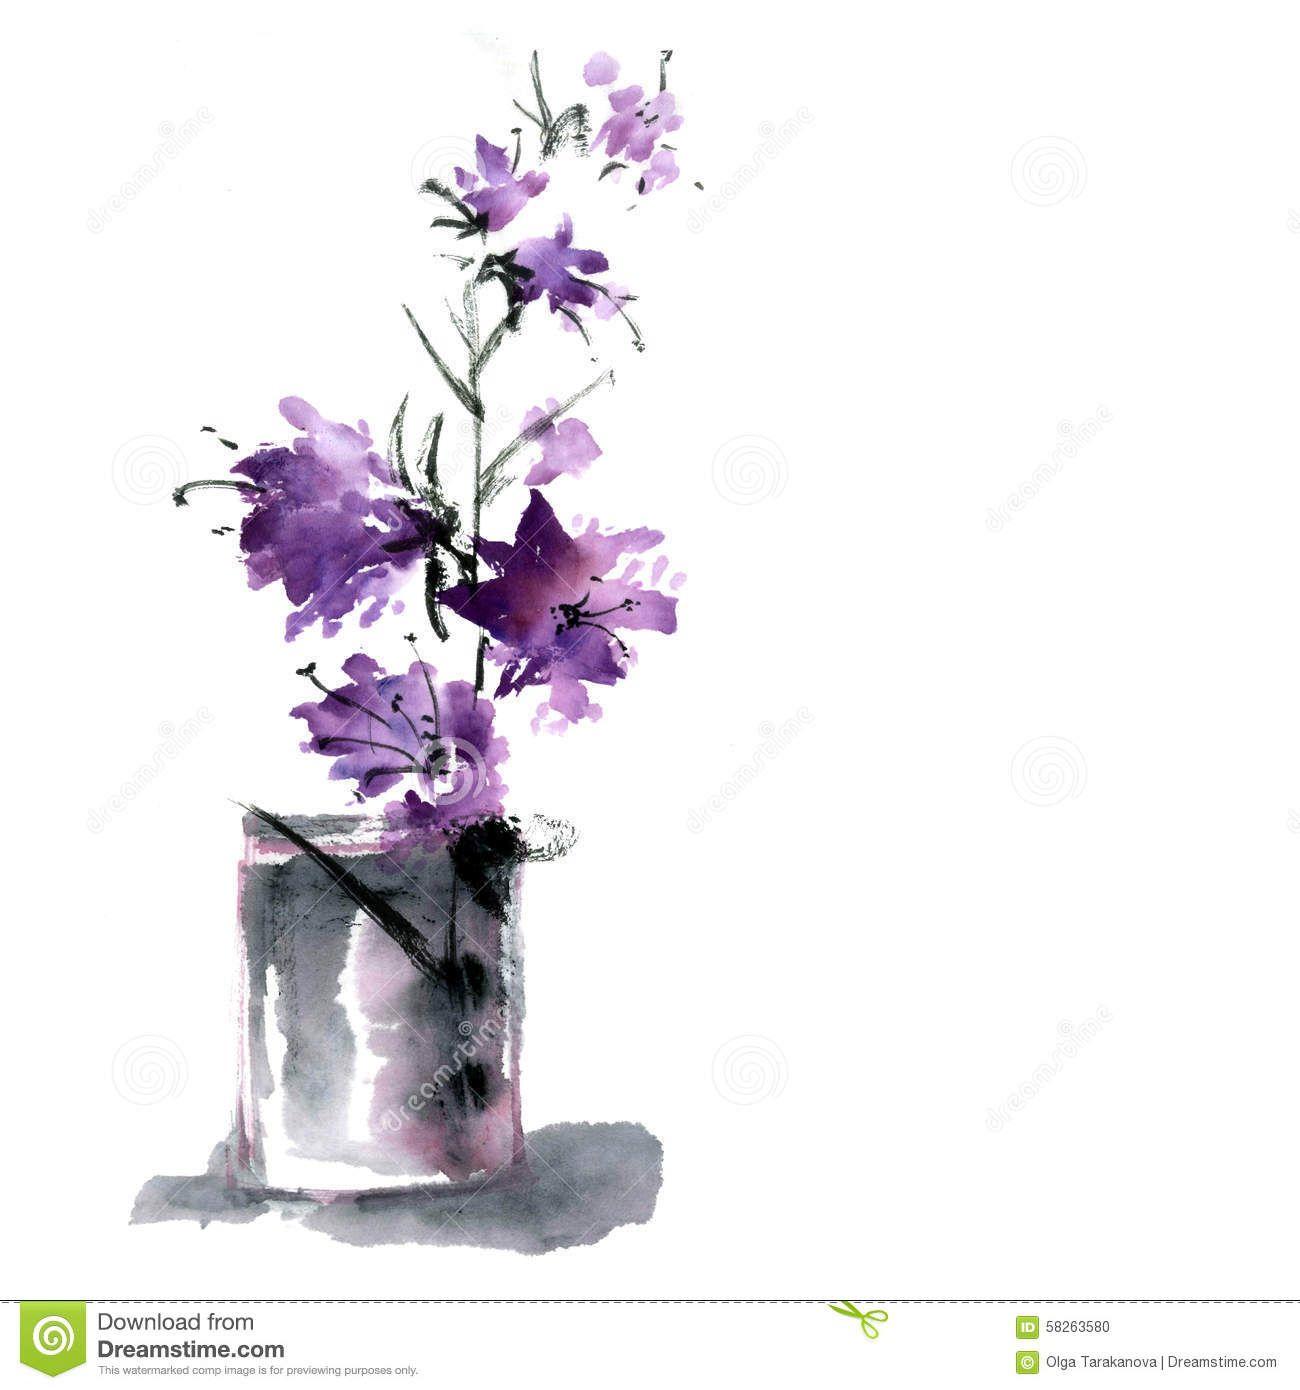 Flower vase watercolor ink illustration style sumi e u sin flower vase watercolor ink illustration style sumi e u floridaeventfo Images